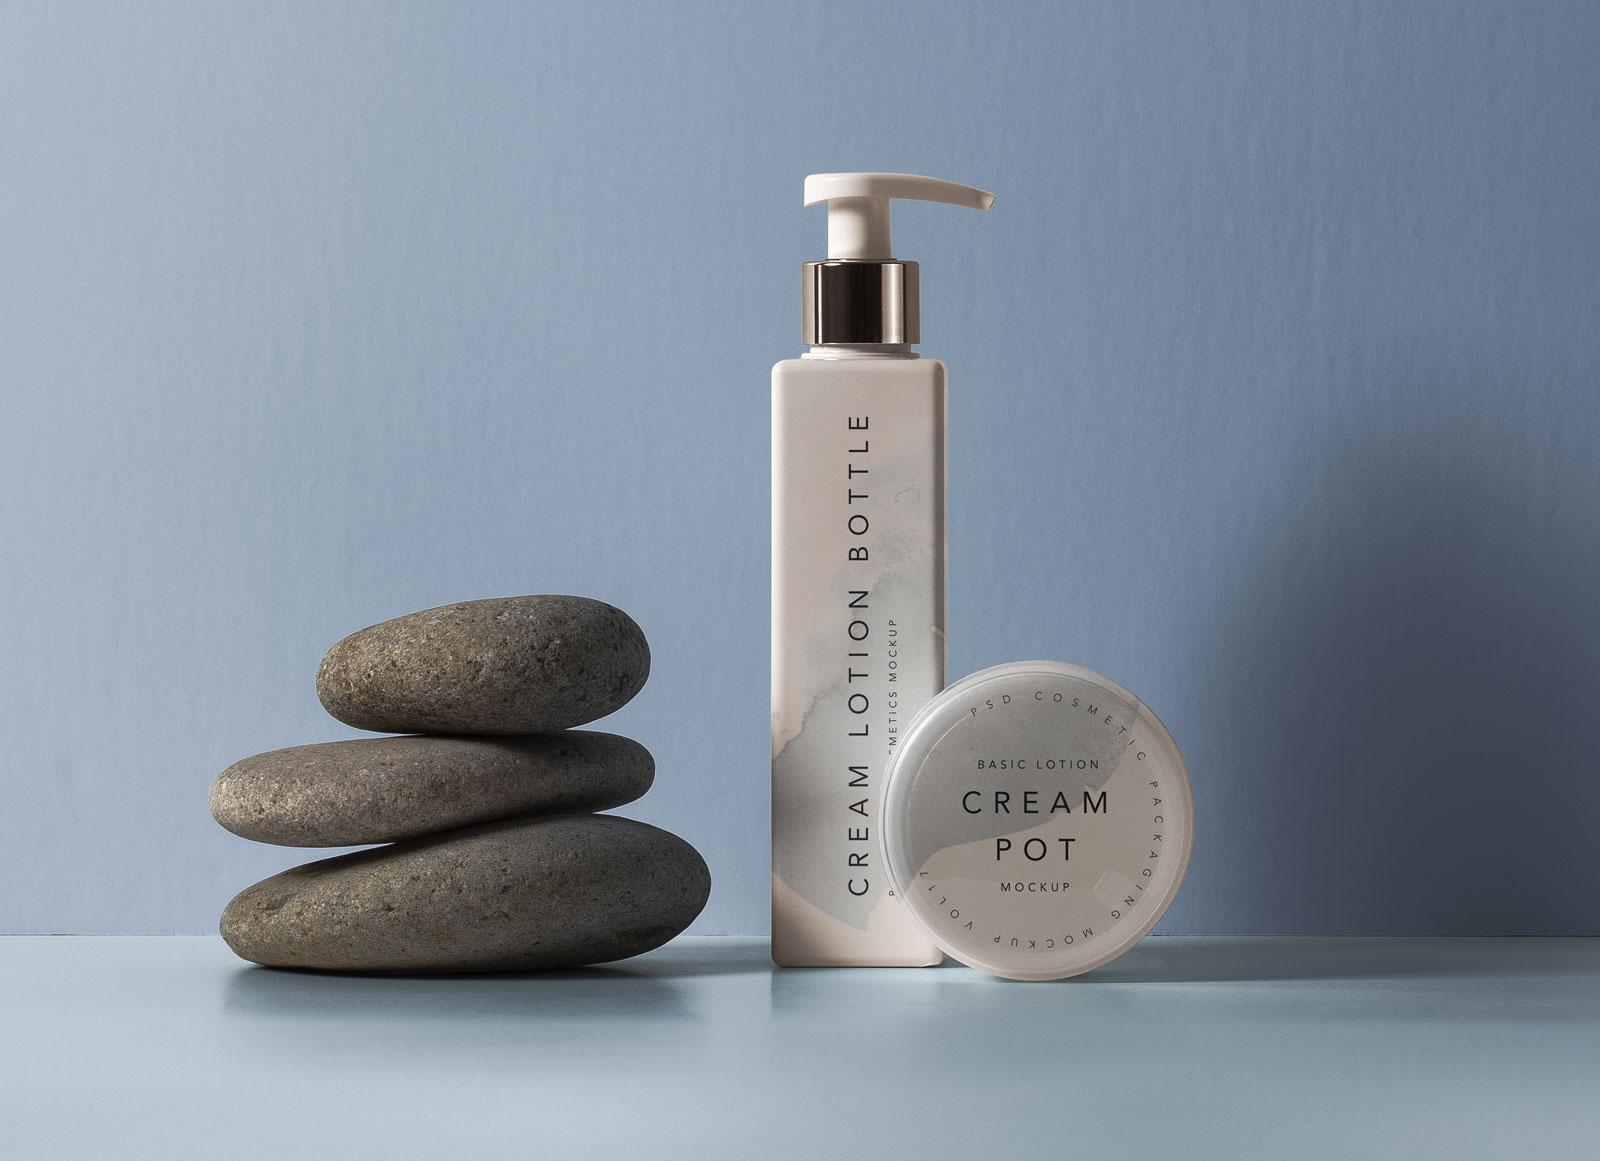 Free-Cream-Lotion-Bottle-&-Pot-Mockup-PSD